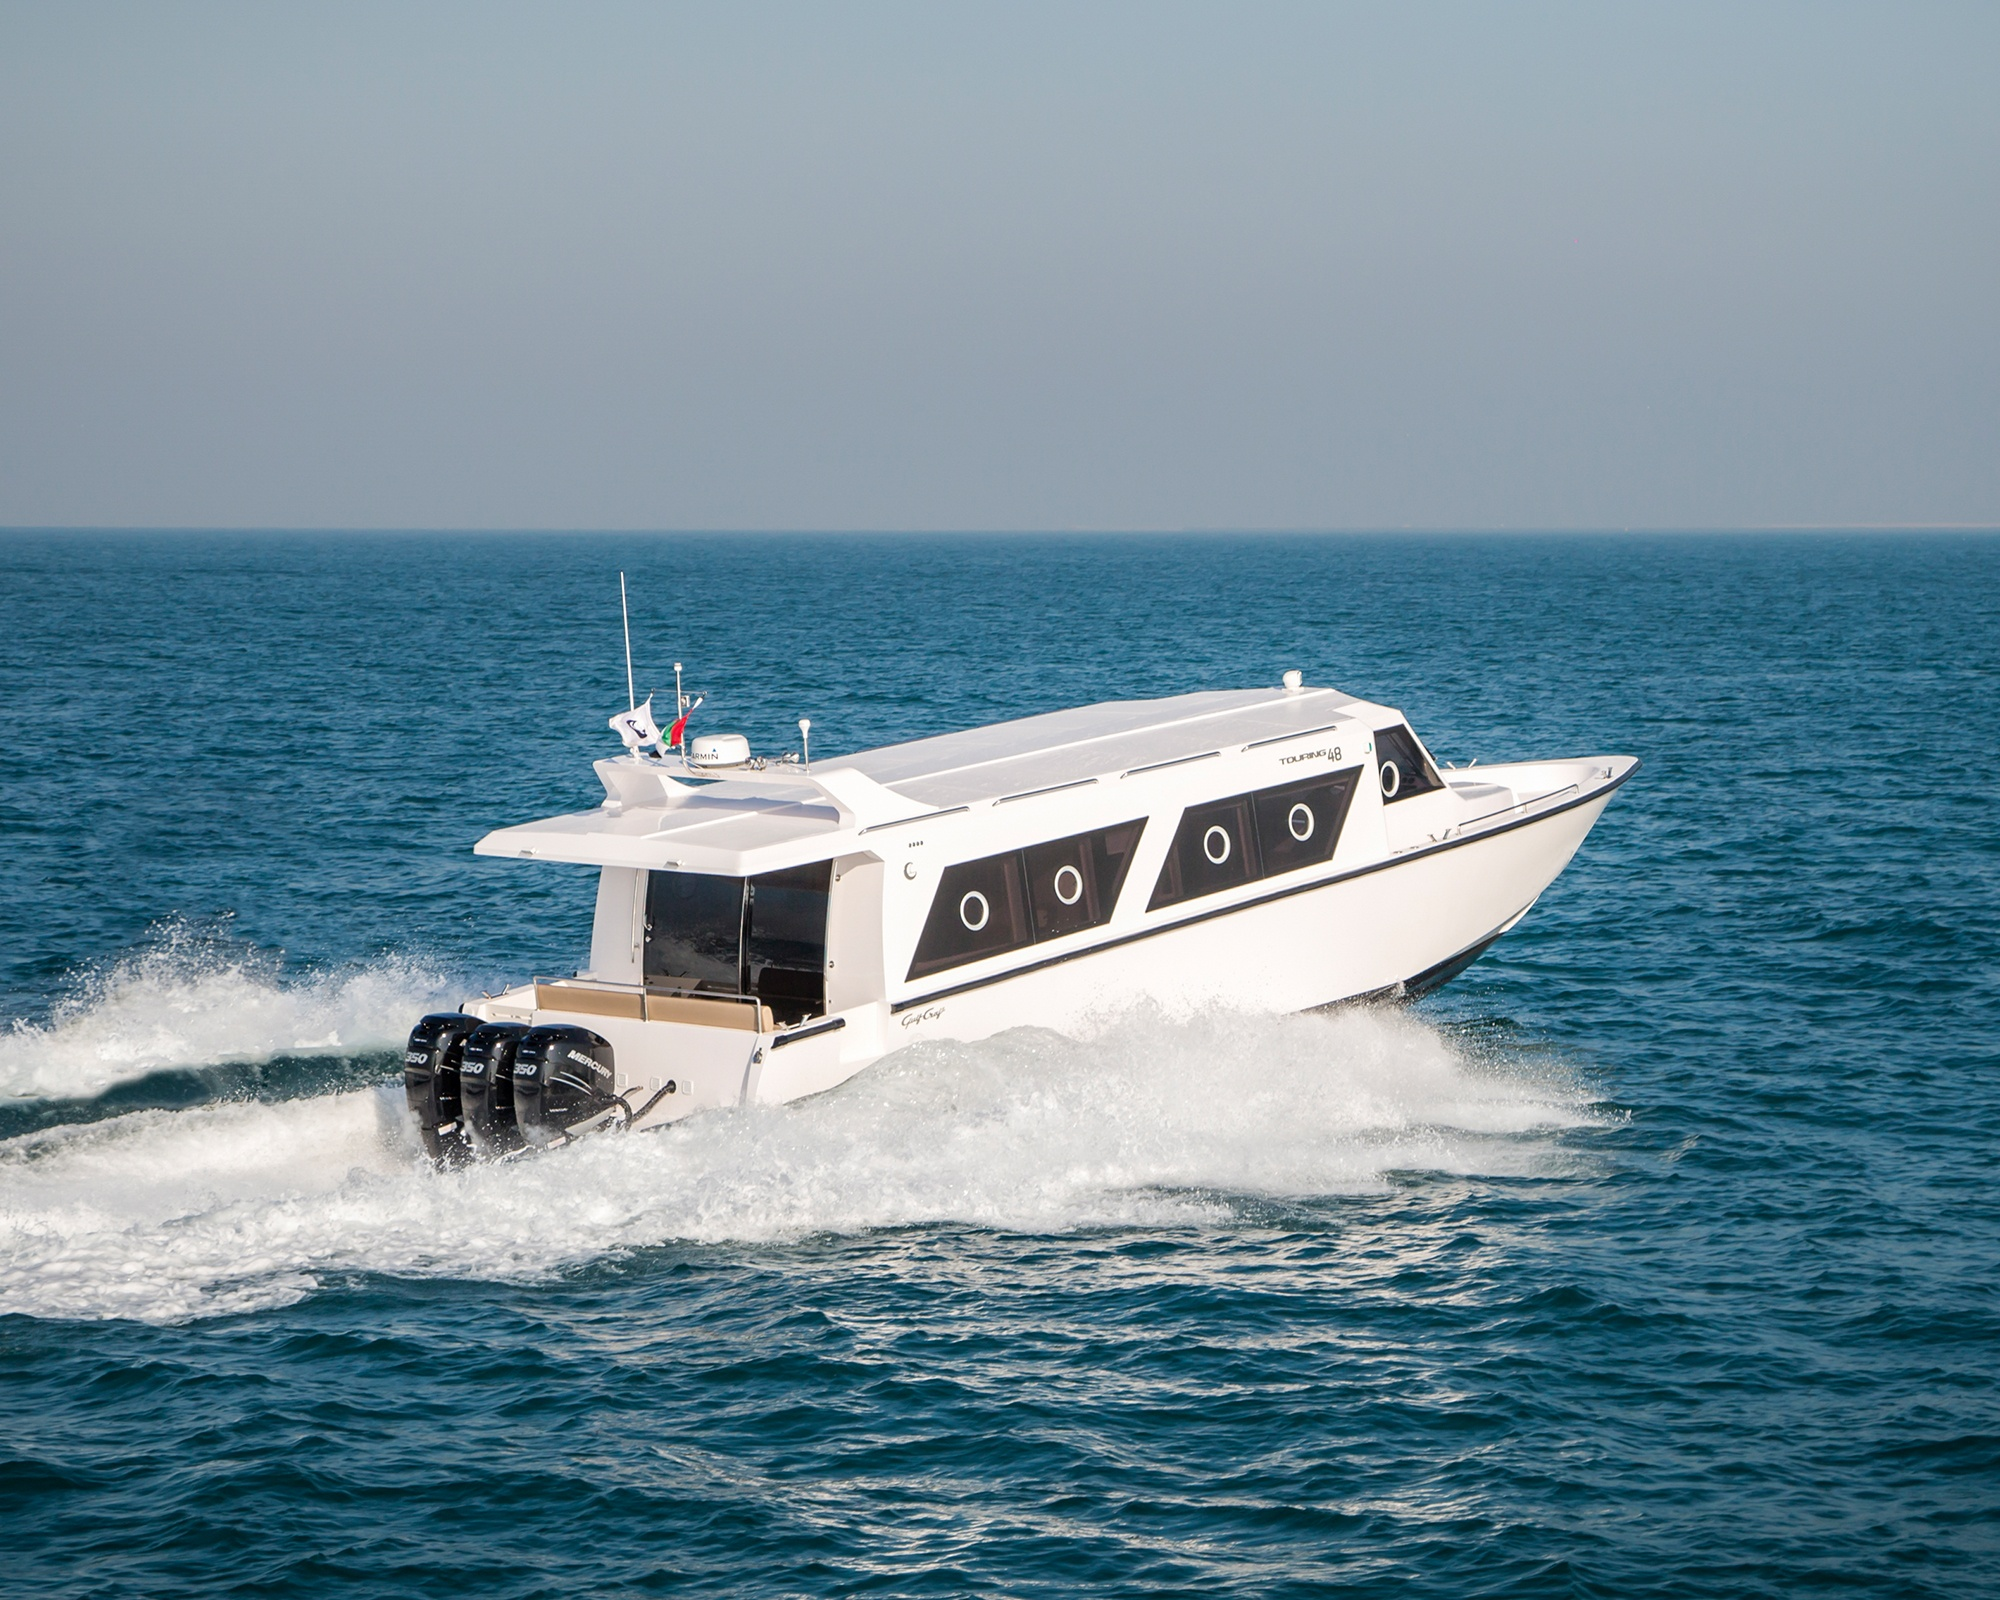 Touring 48 VIP-version passenger boat